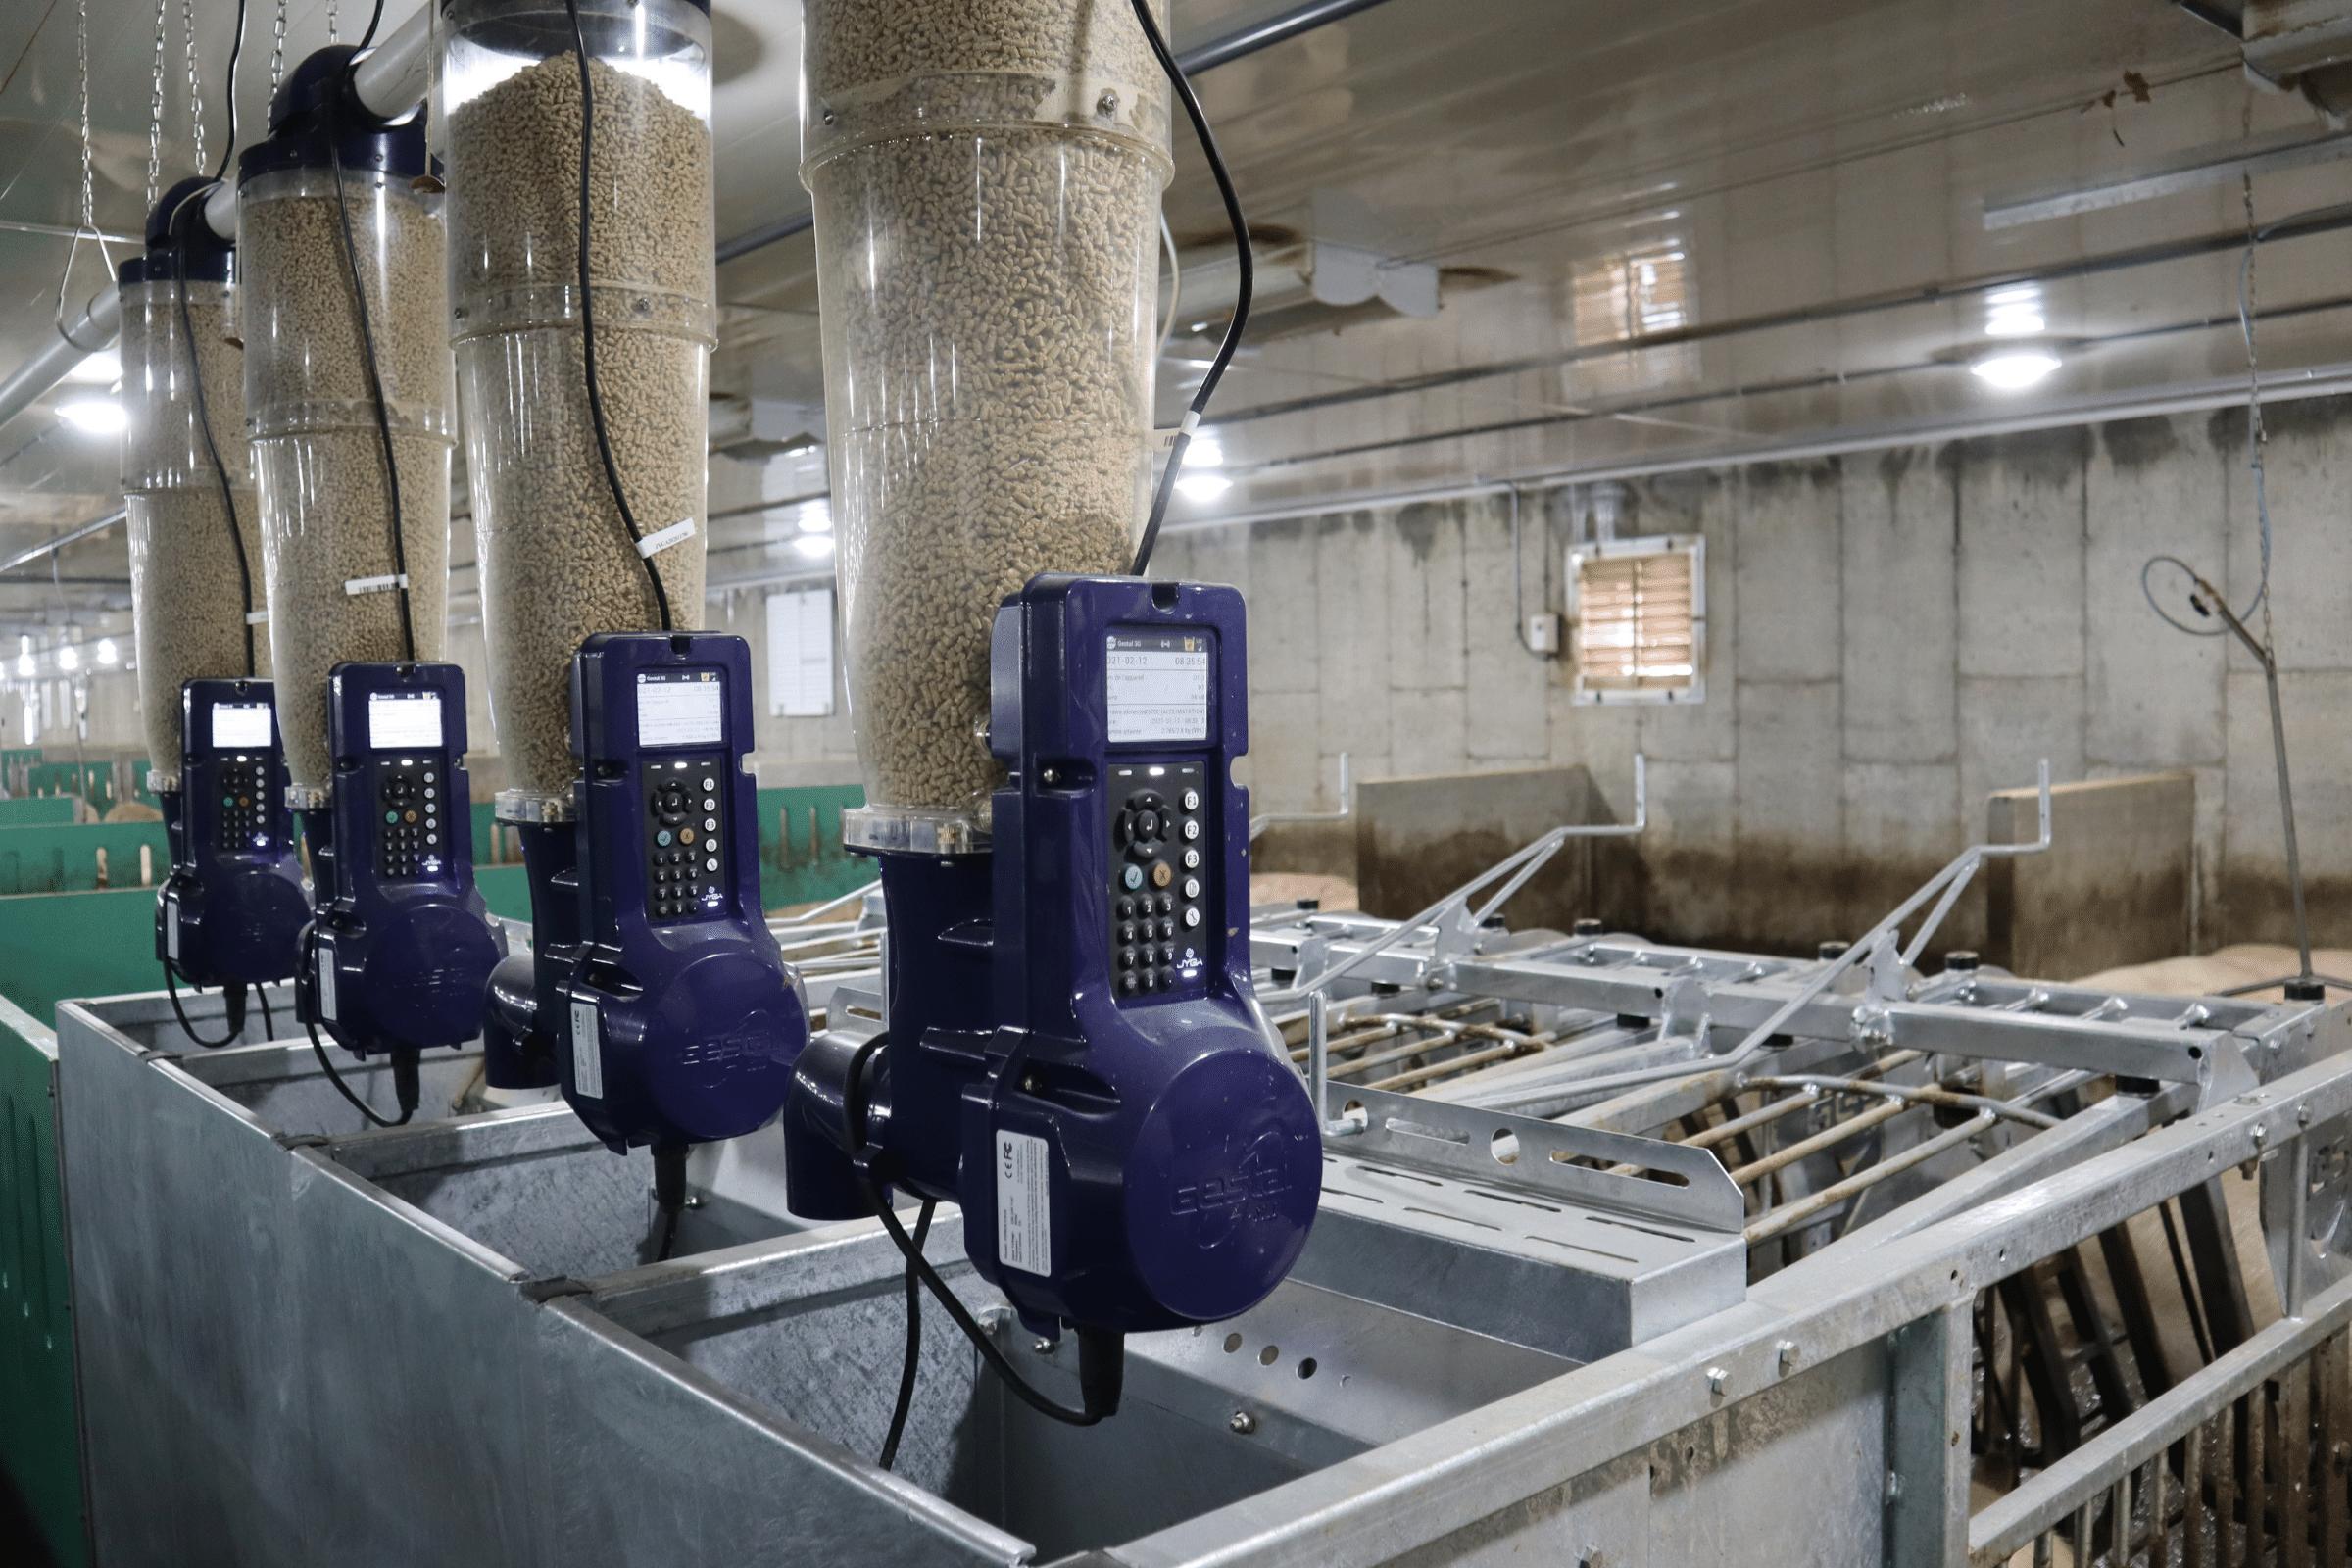 Gestation equipment